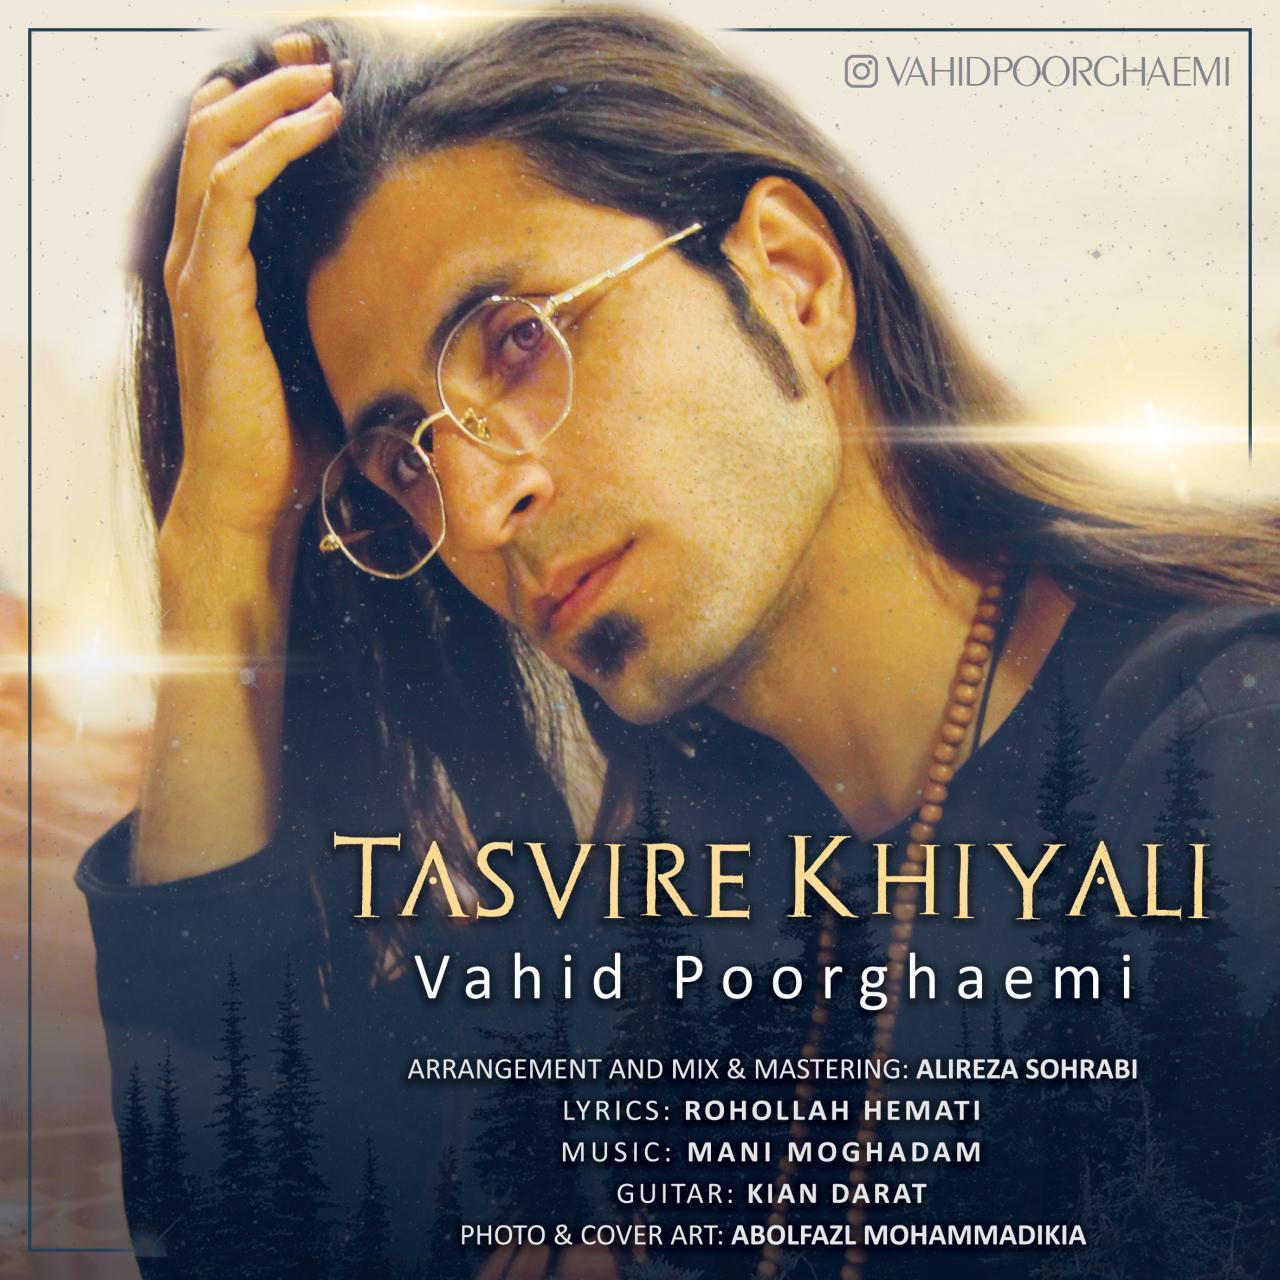 Vahid Poorghaemi – Tasvire Khiyali